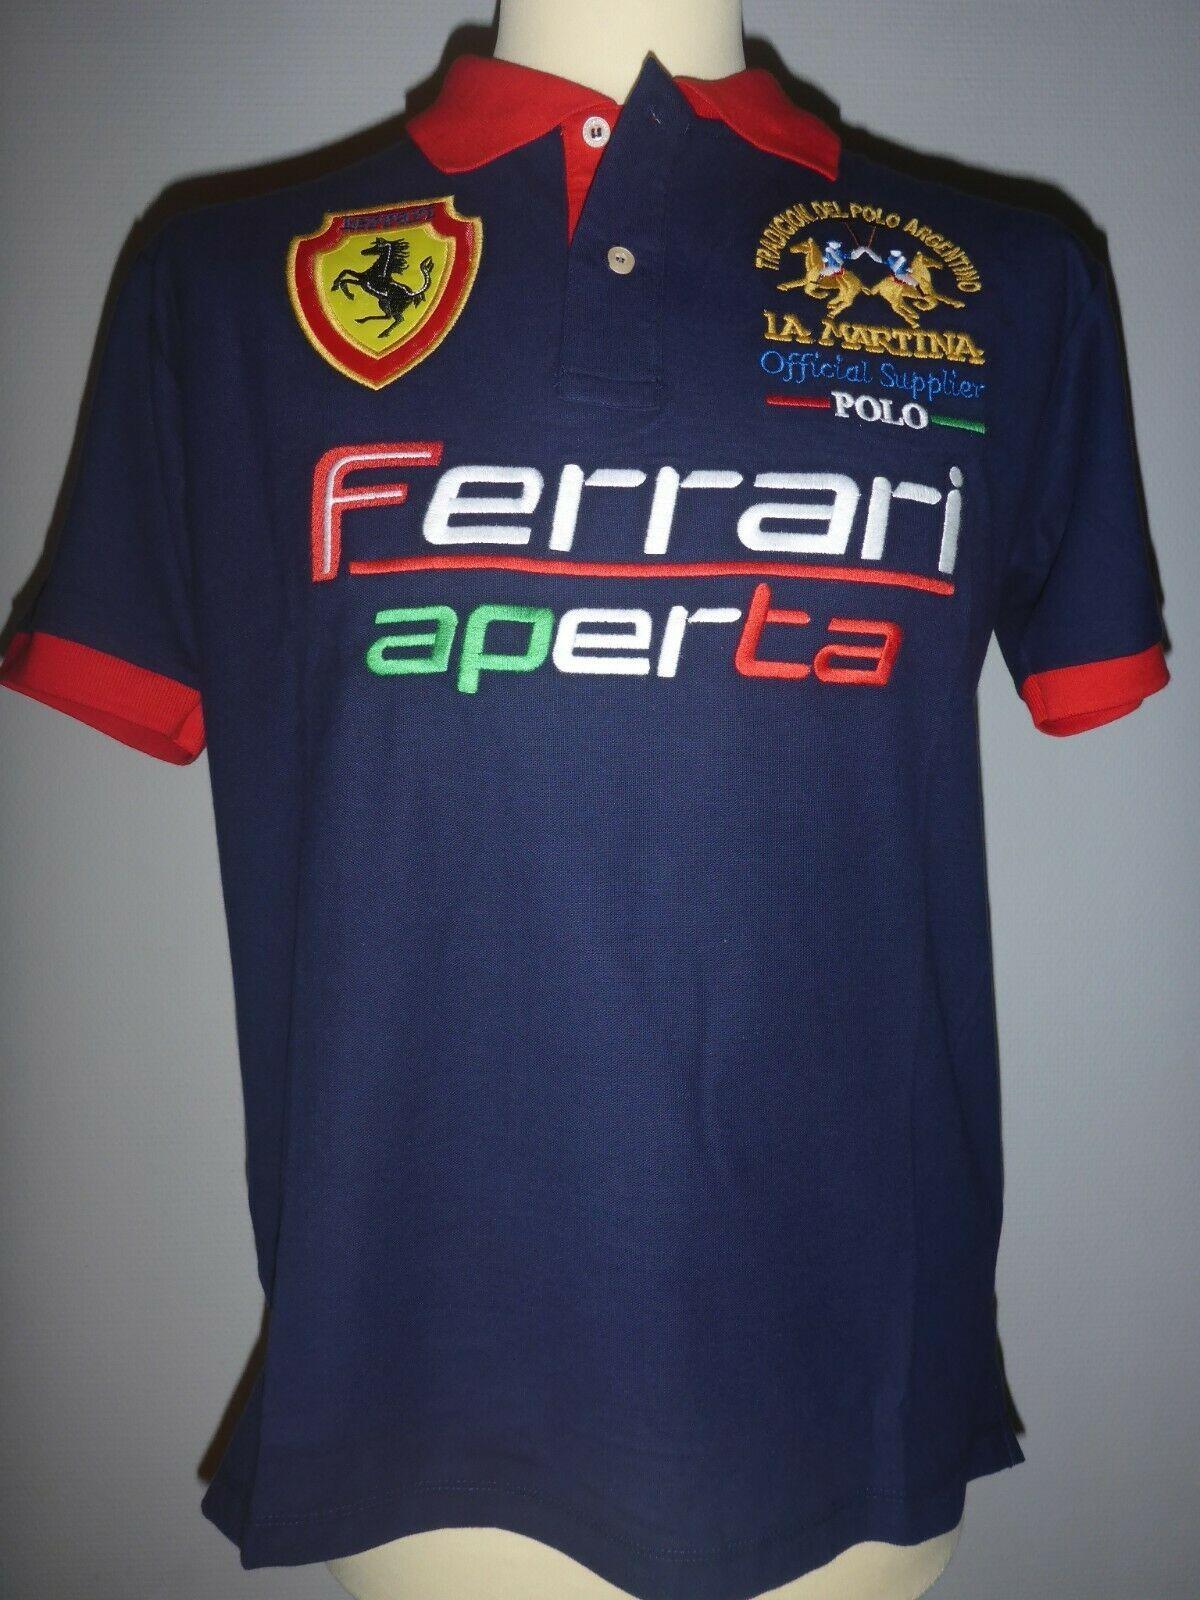 La Martina Herren Polo Shirt Gr M Dunkelblau Brandneu Ferrari Aperta Polo Polo Shirt Shirts